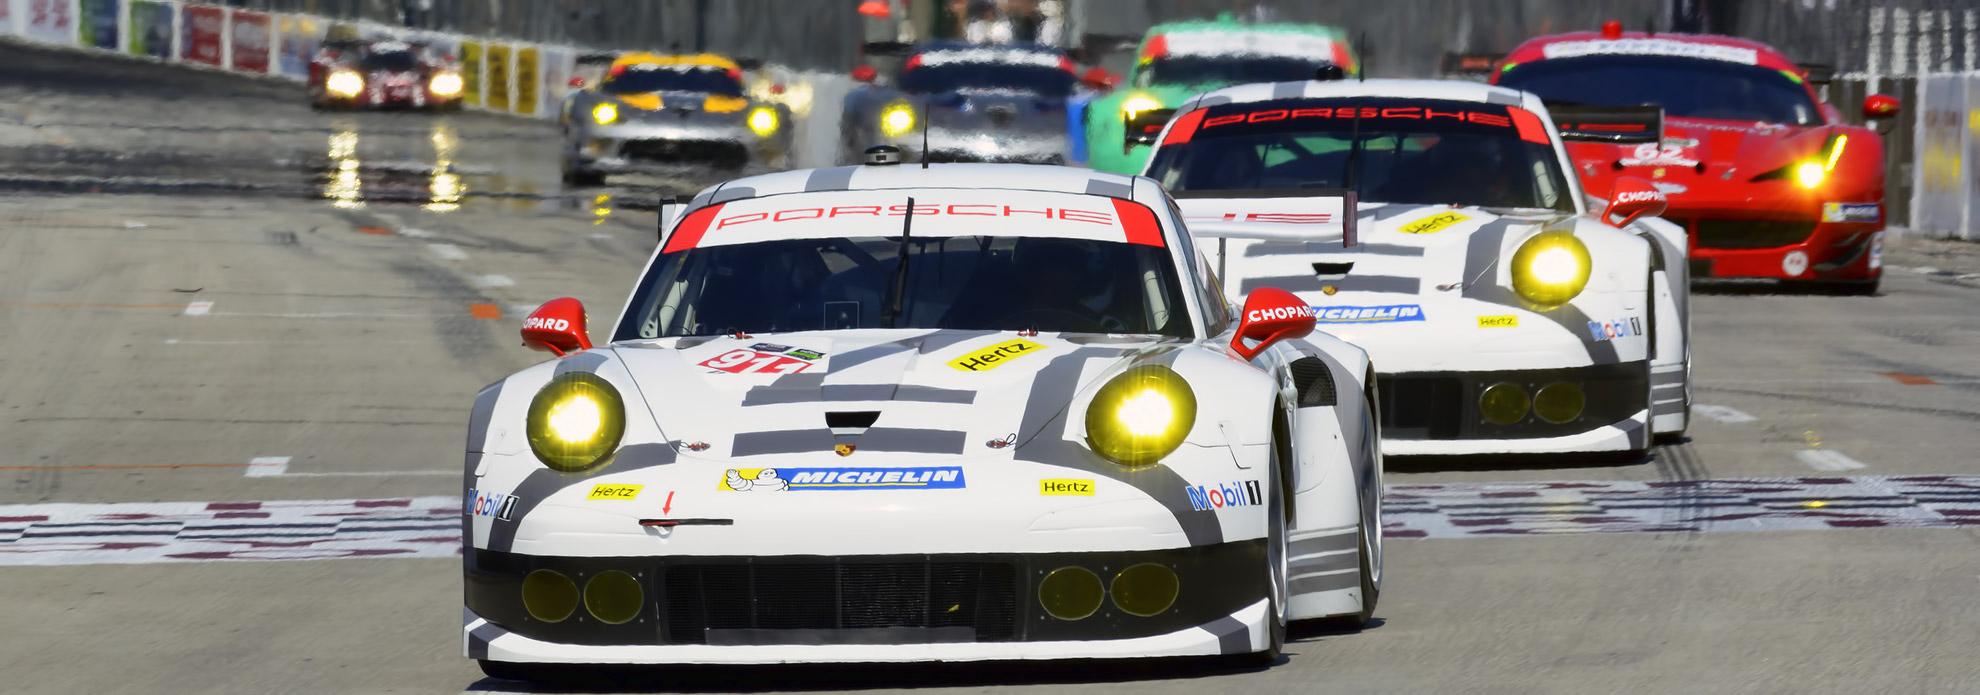 Long Beach Grand Prix Racing